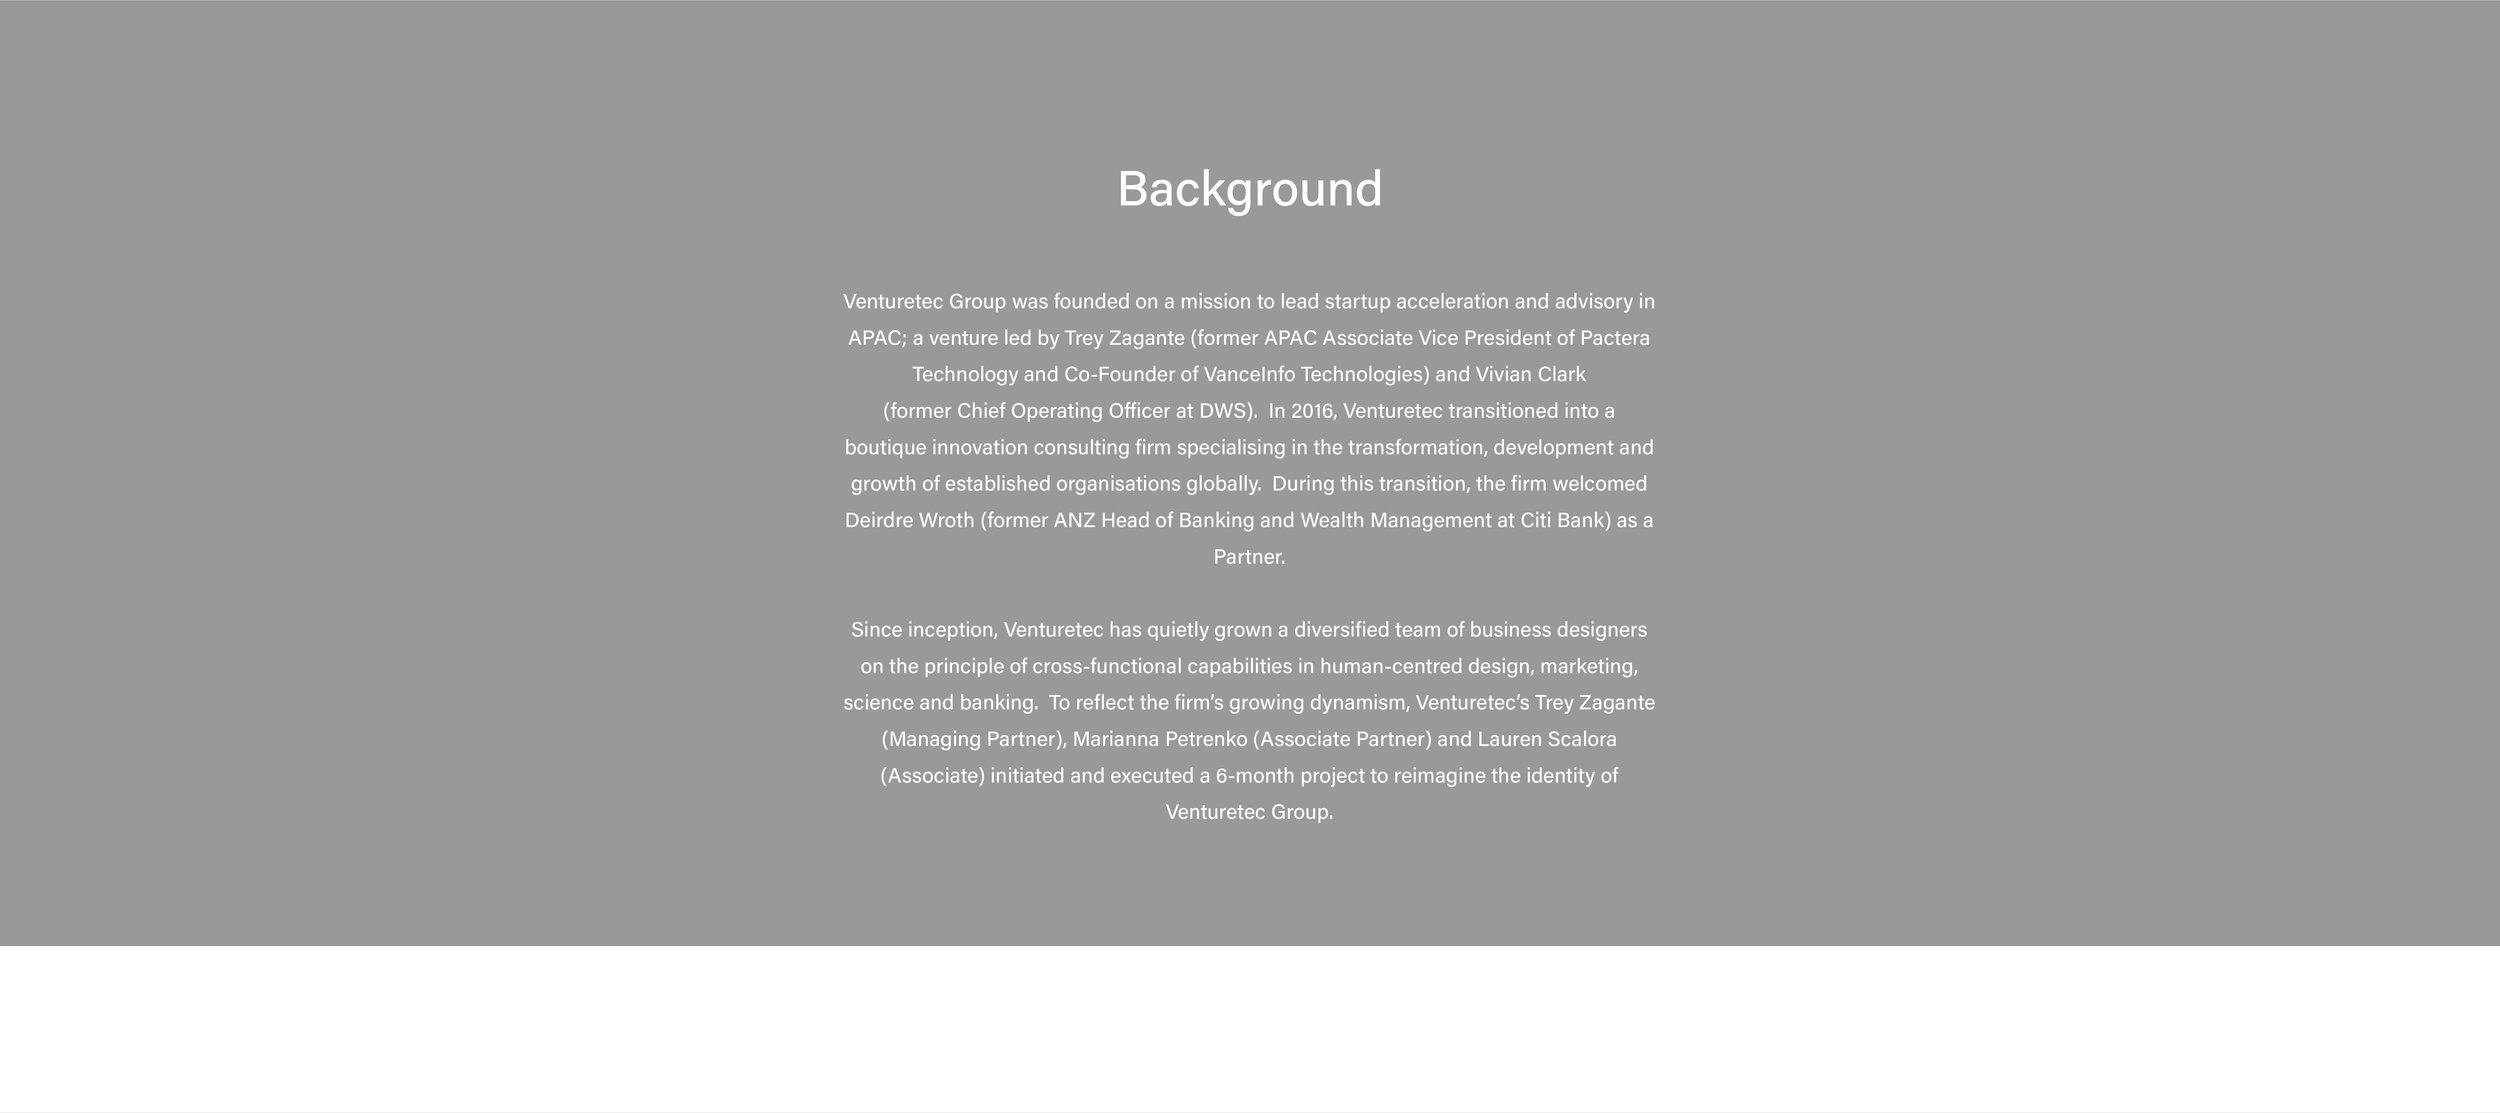 BrandIdentity-01.jpg